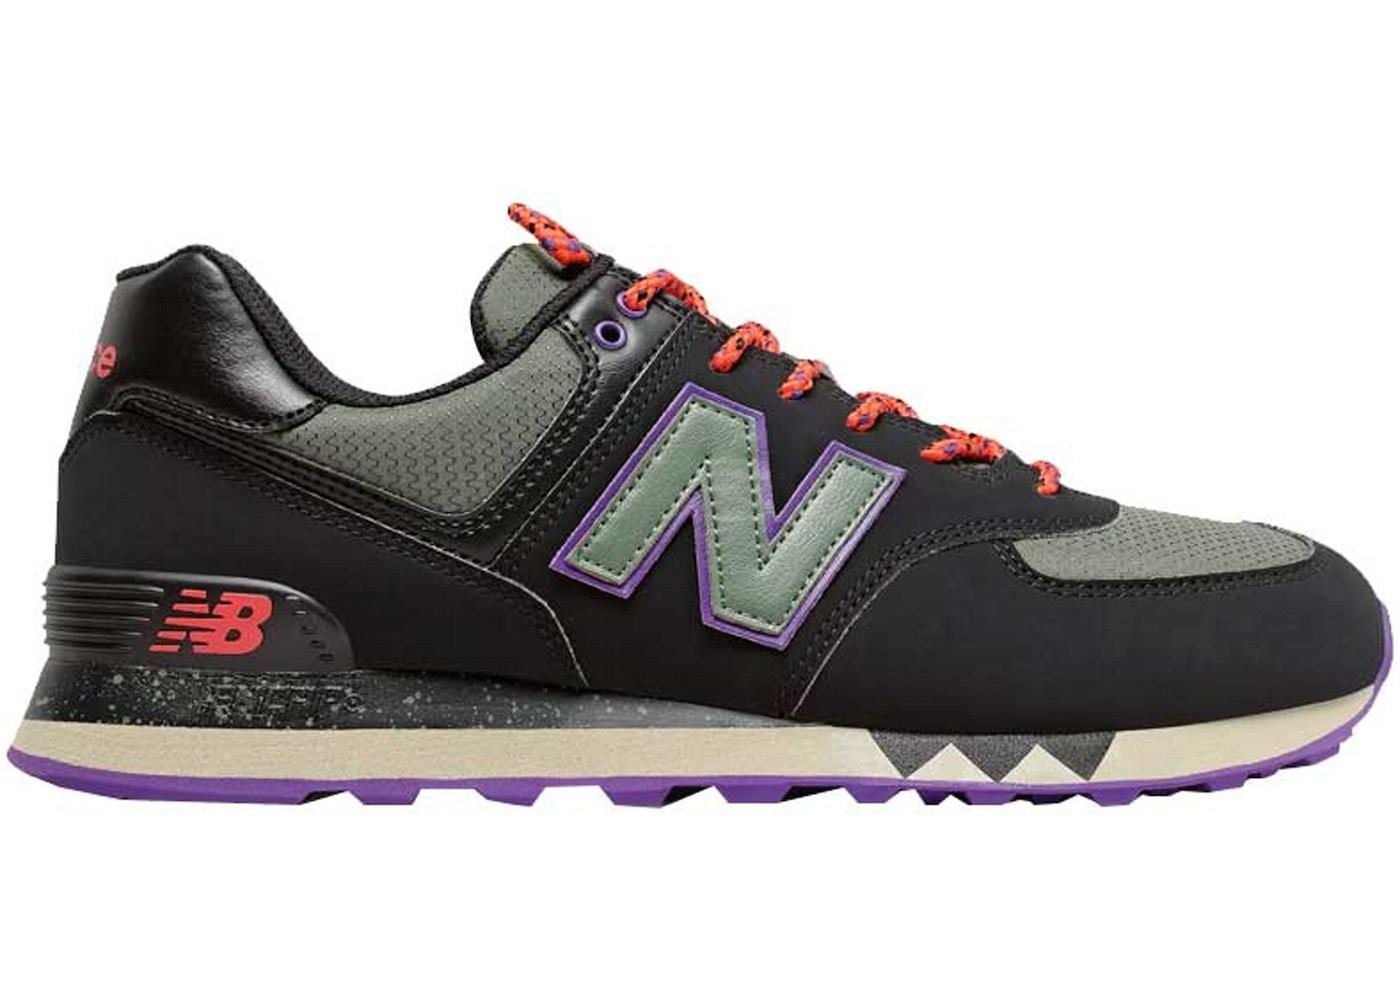 new balance 574 outdoor